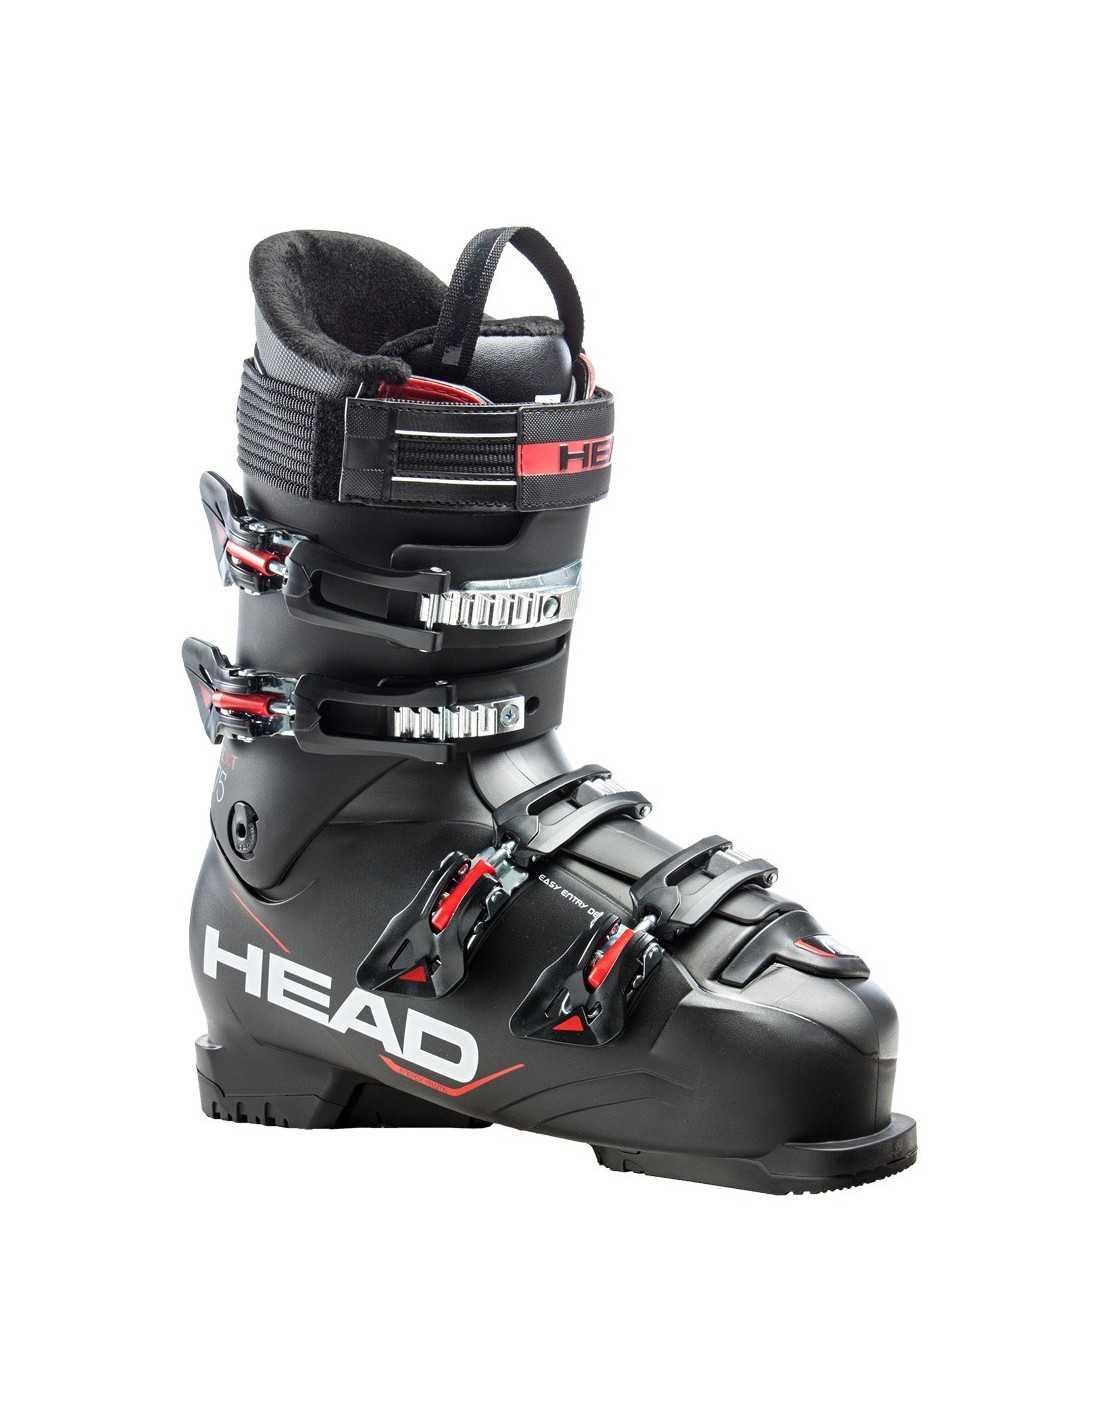 Botas De Esqui Ski Boots Head Next Edge 75 605201 Esqui